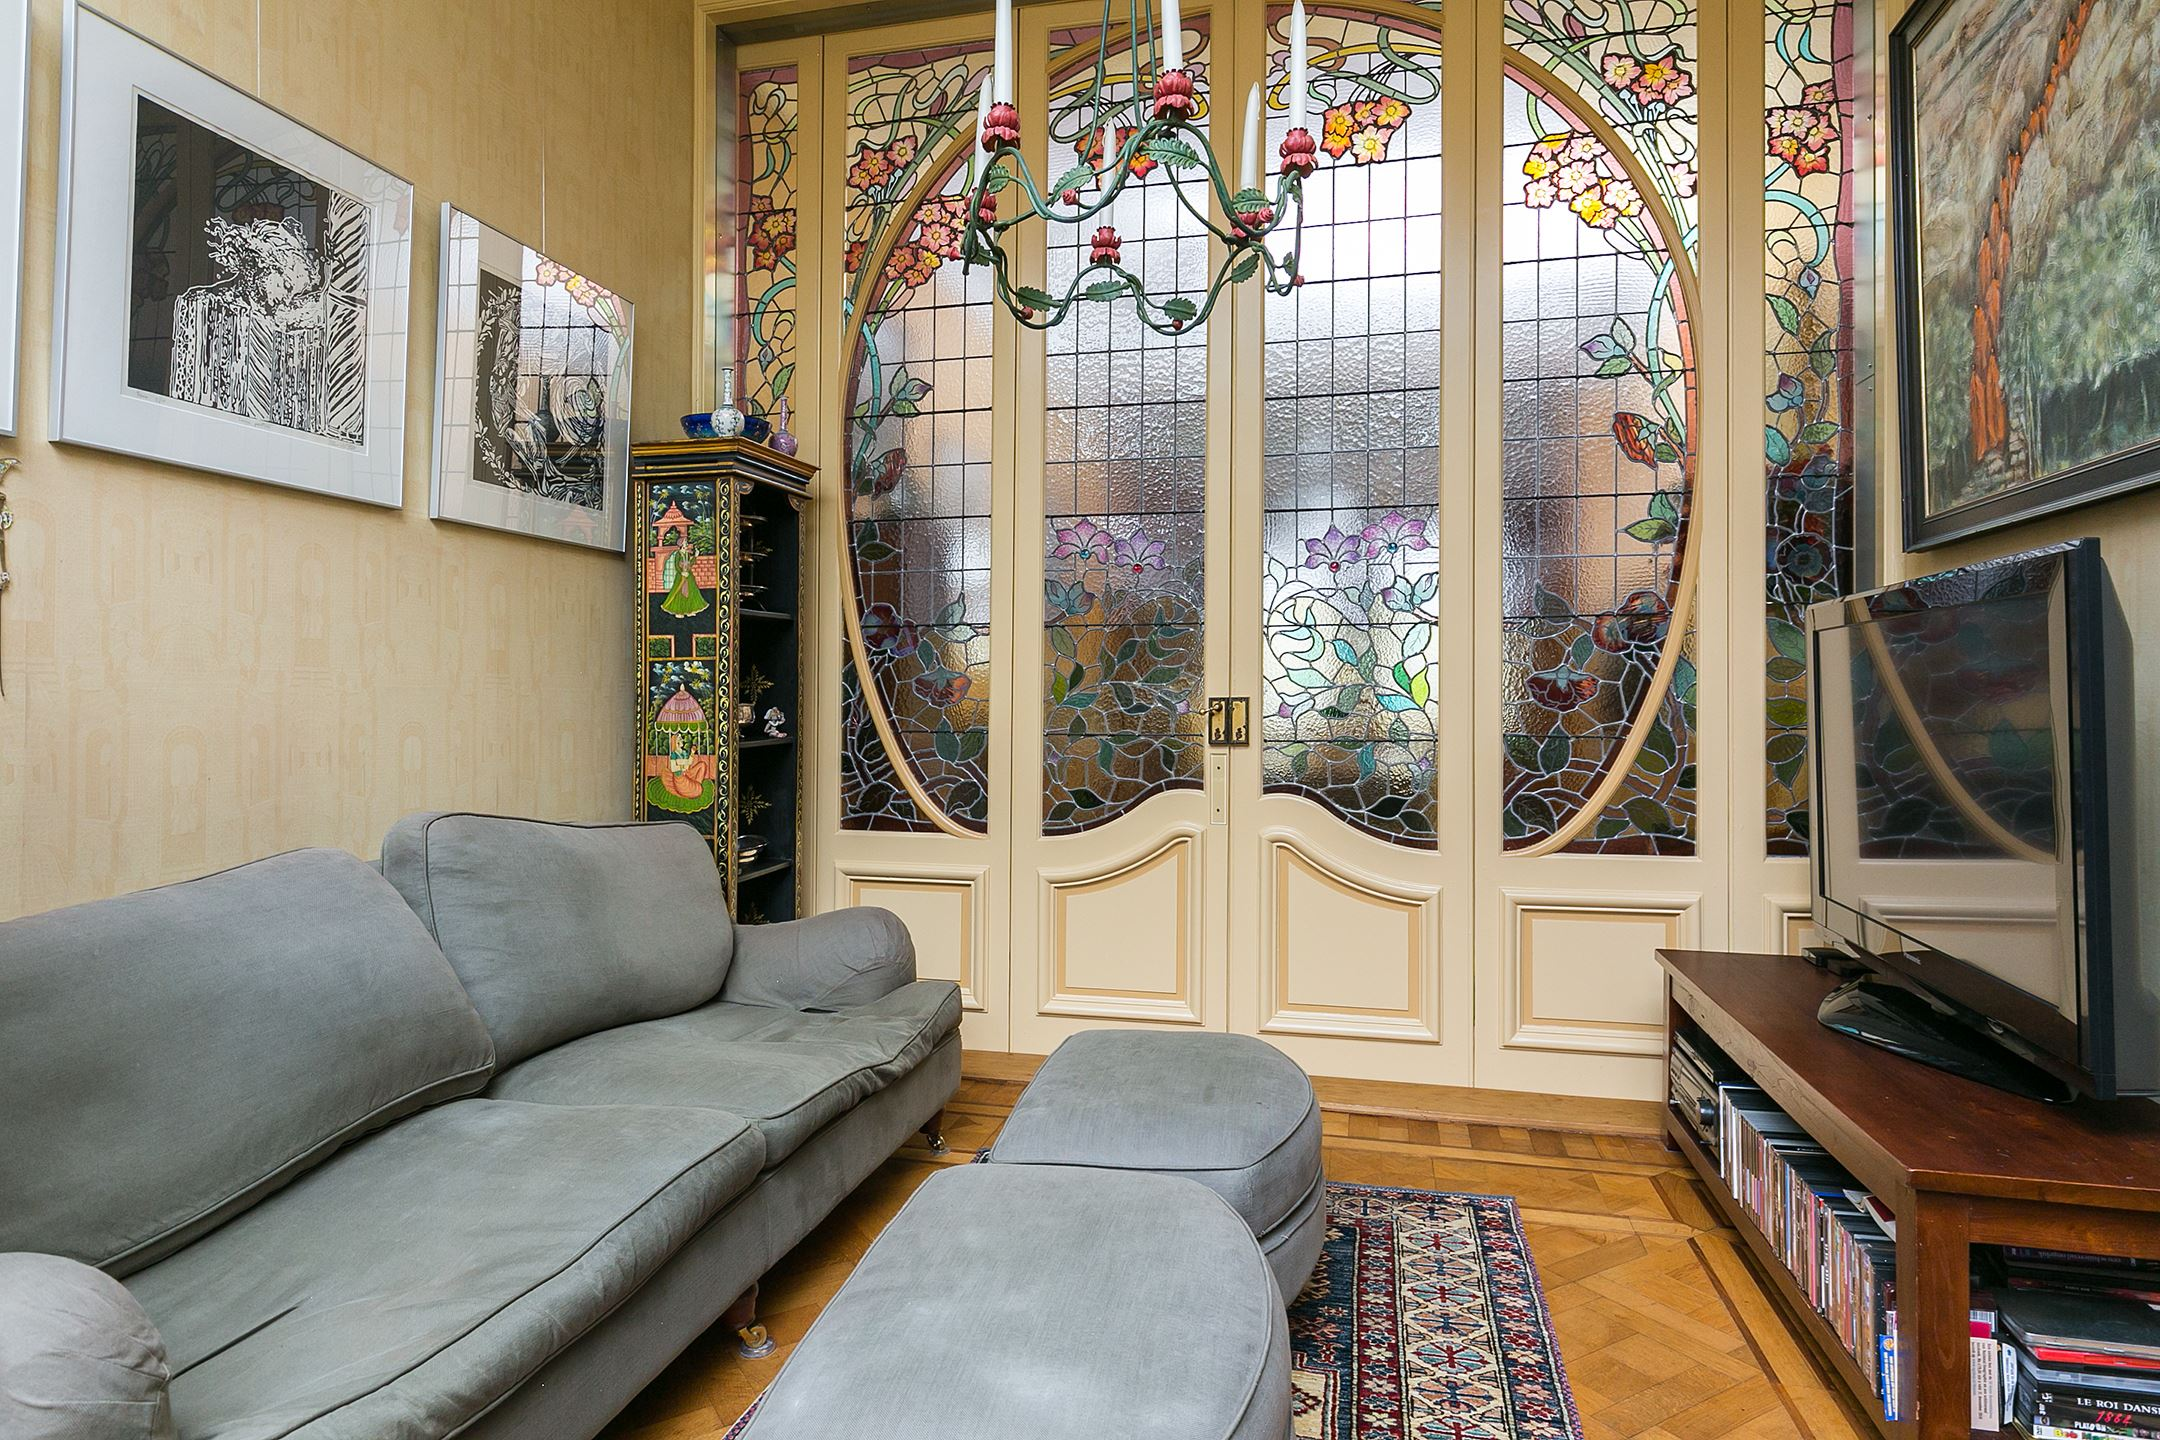 Huis te koop: Turfmarkt 104 2801 HC Gouda [funda]